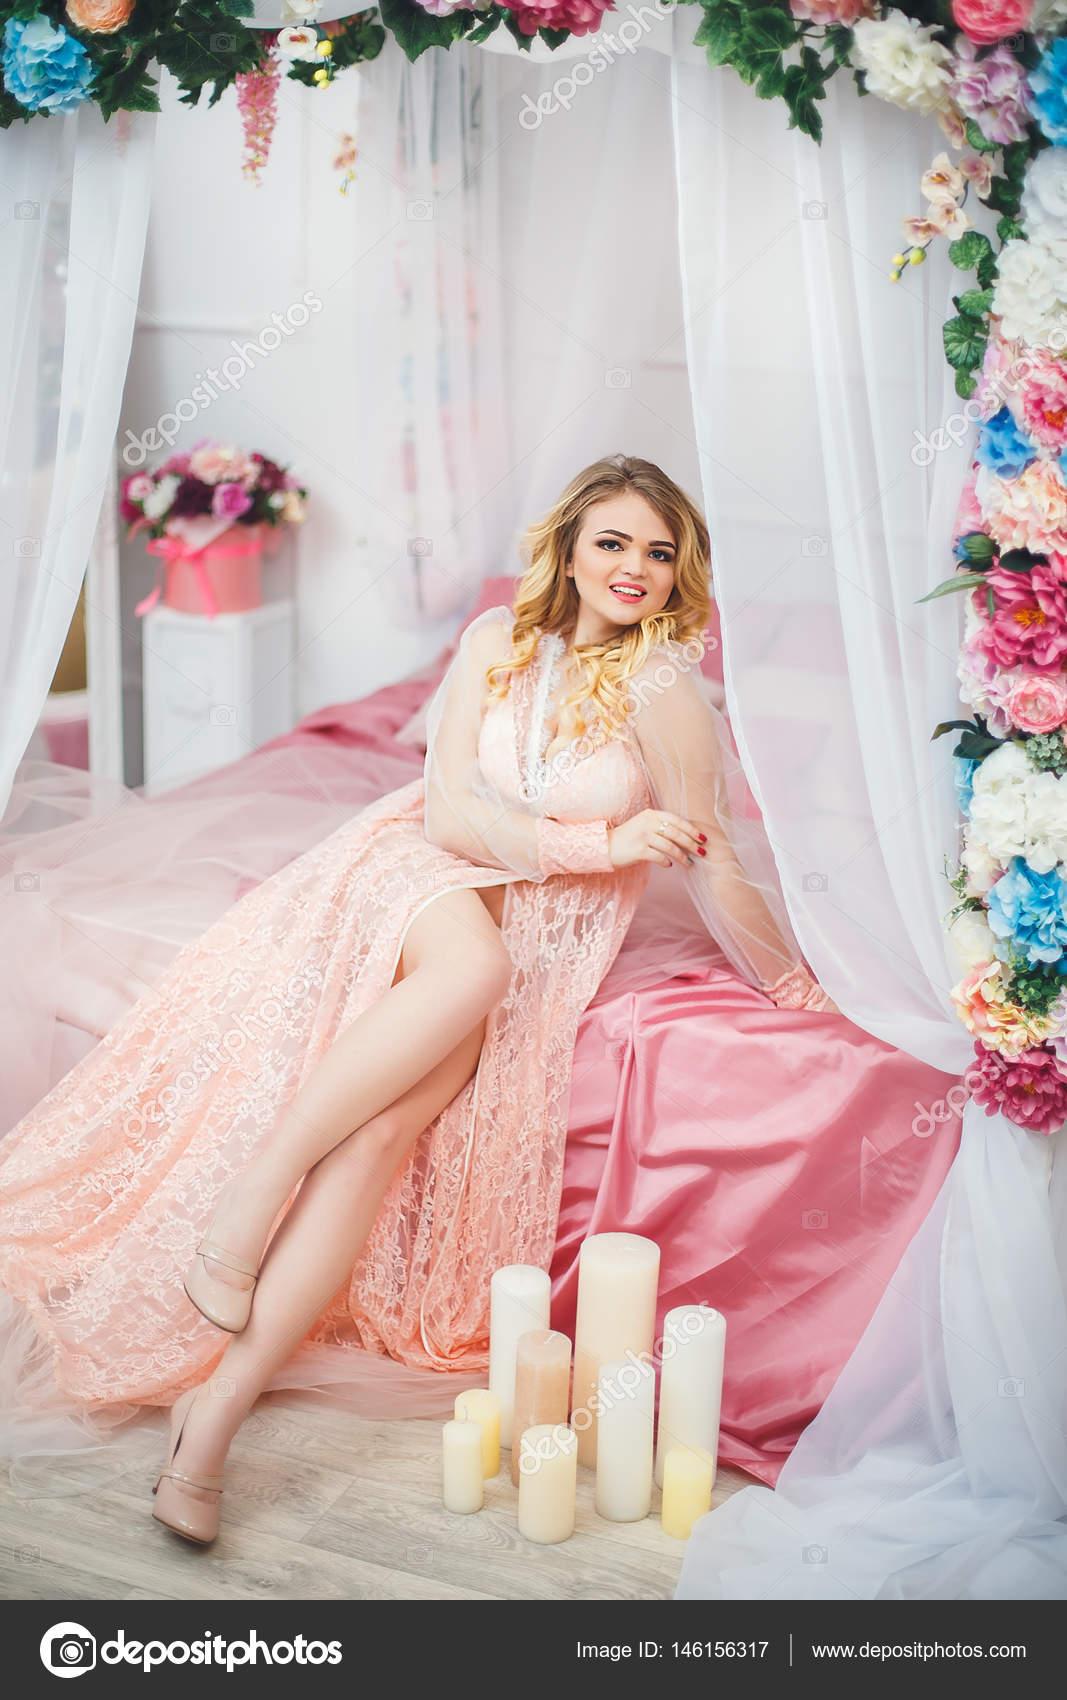 Joven bonita a mujer en bata romántico en cama decorada con flores ...